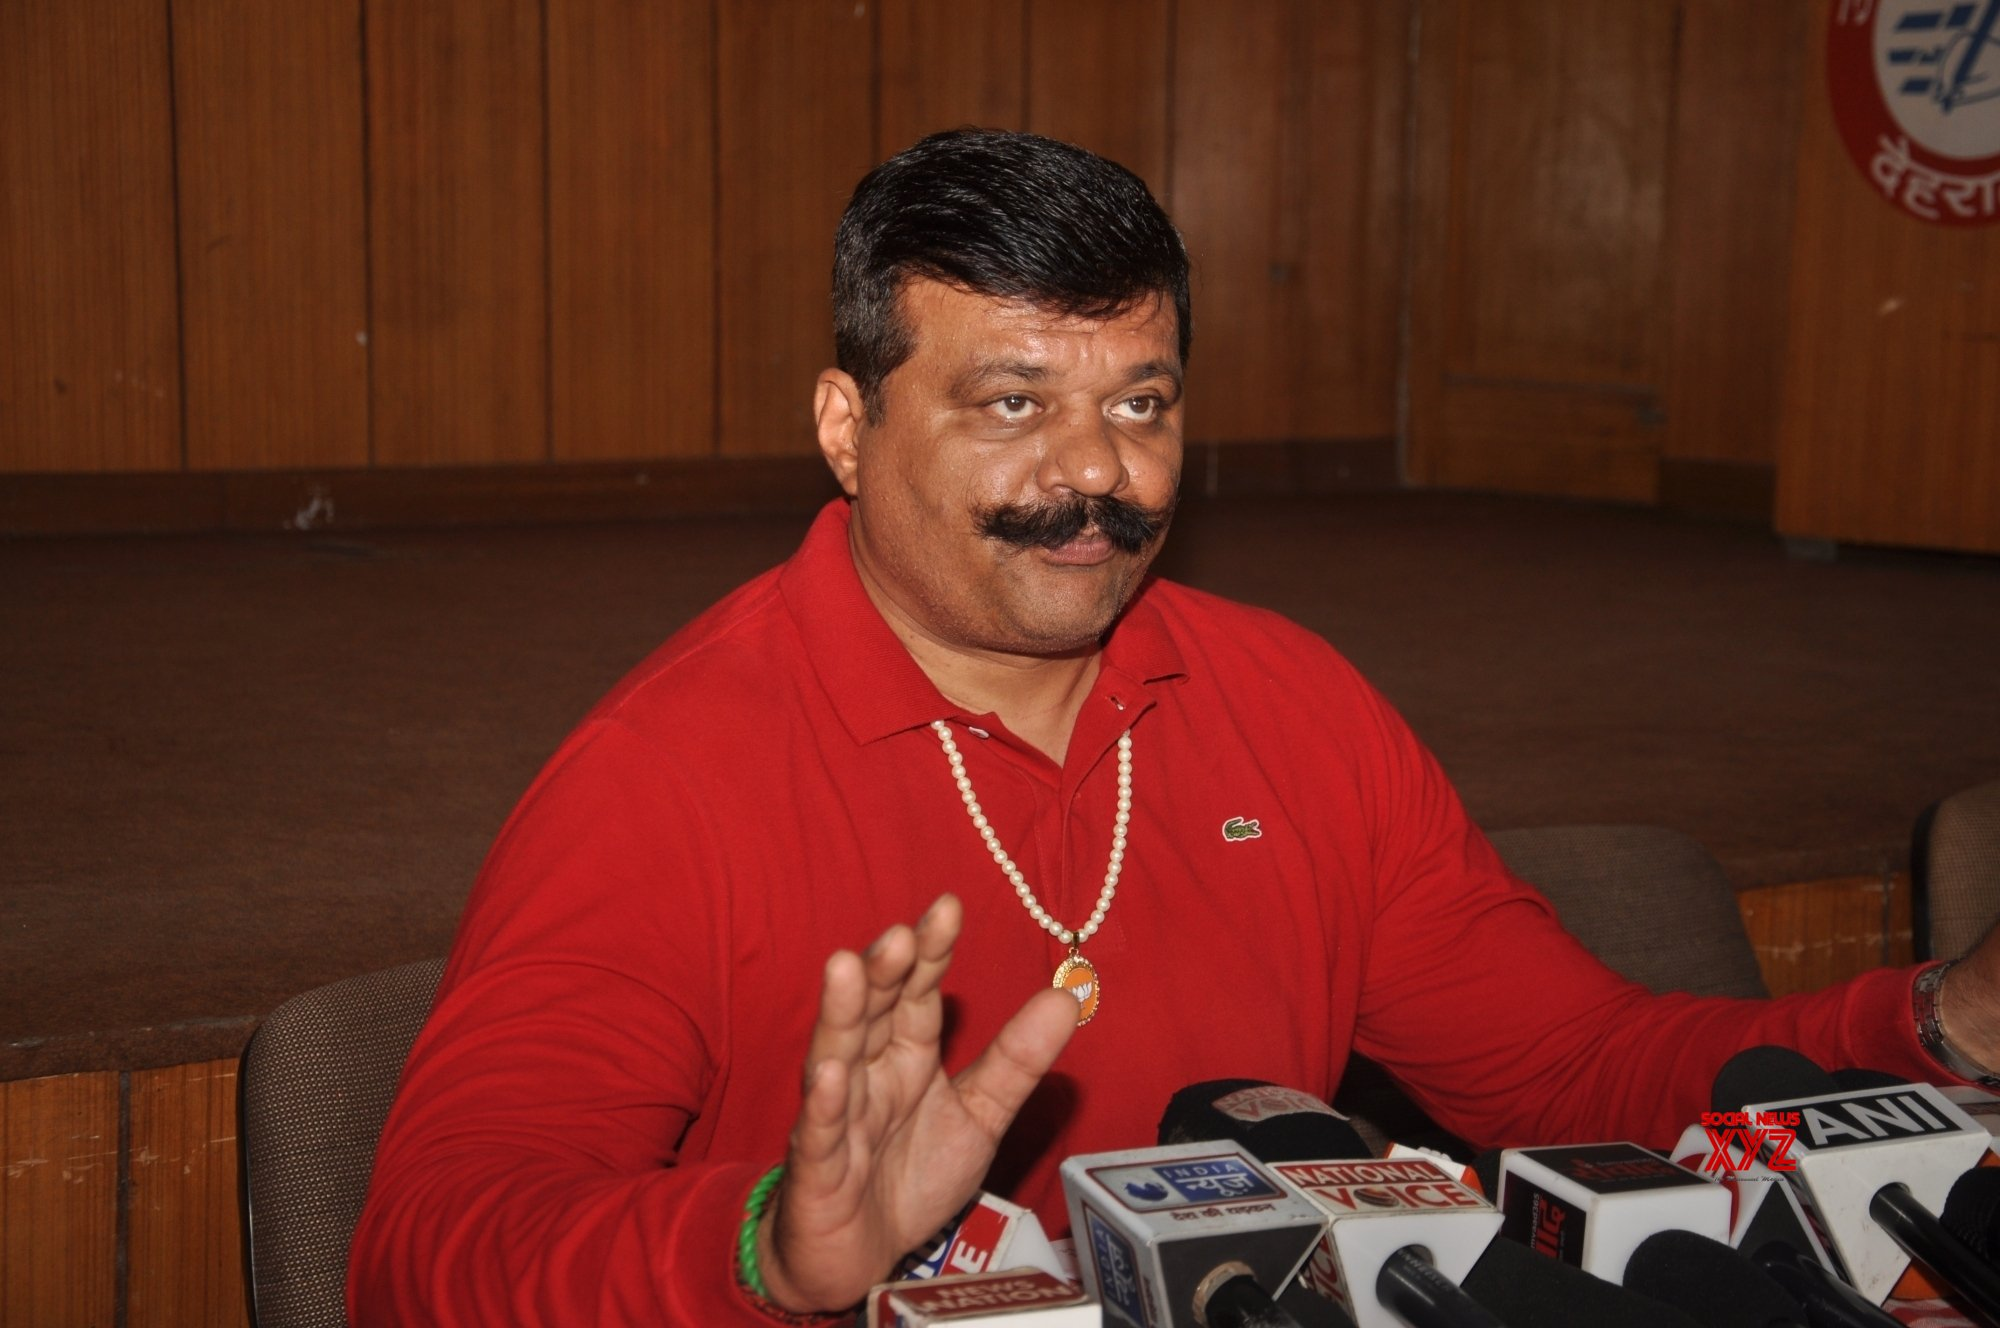 FIR lodged against BJP MLA Champion for abusing people of Uttarakhand